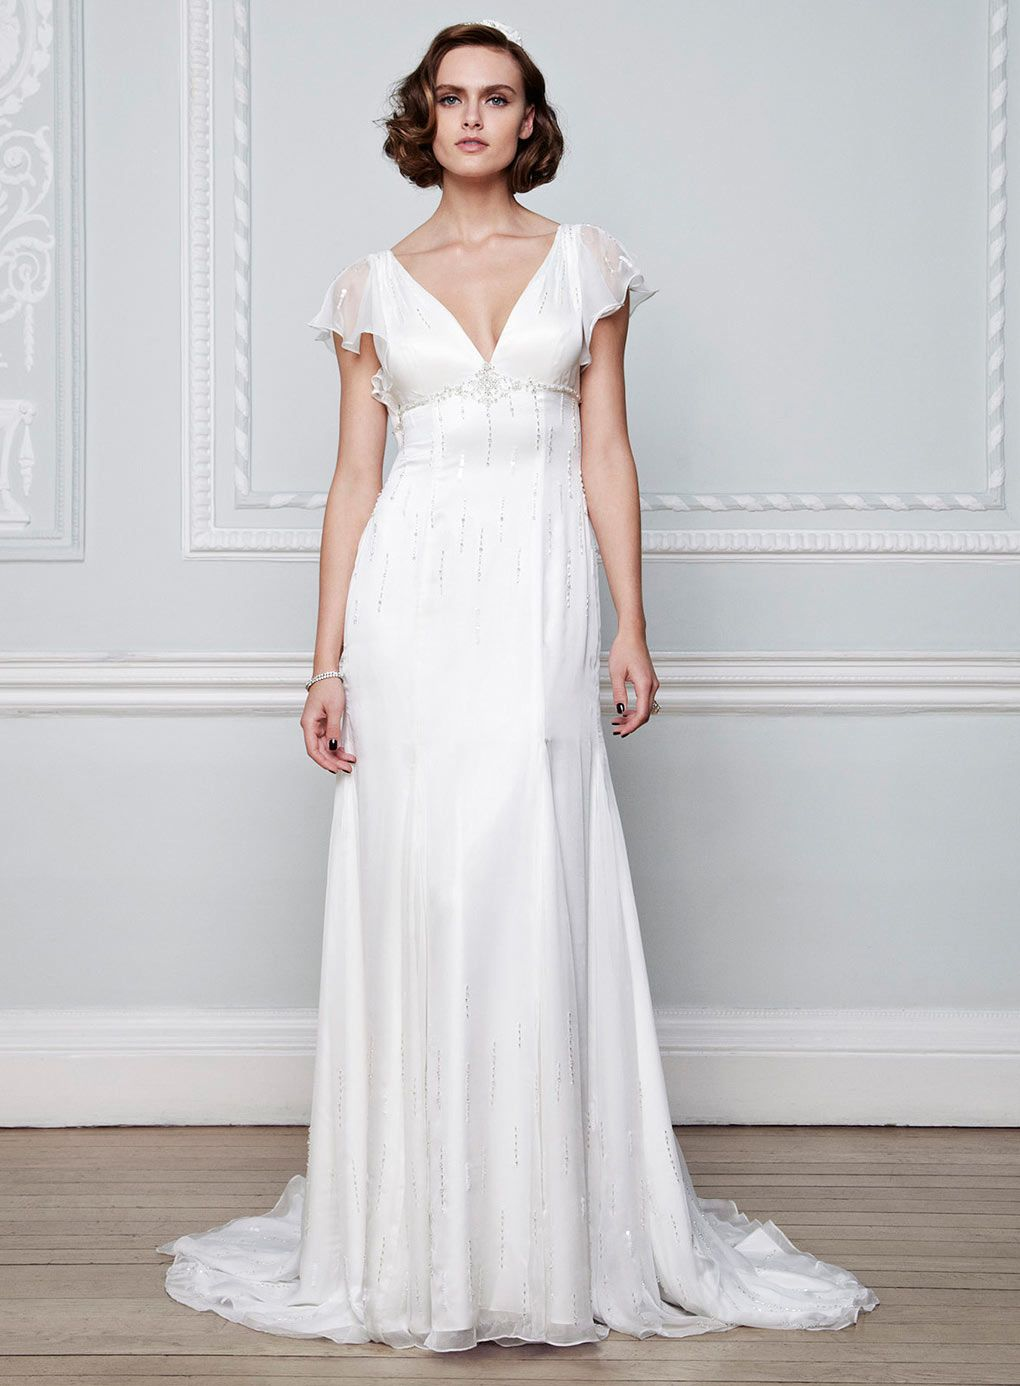 Lillian Vintage Chiffon Ivory Bridal Dress Wedding Dresses The Bride Wedding Bhs